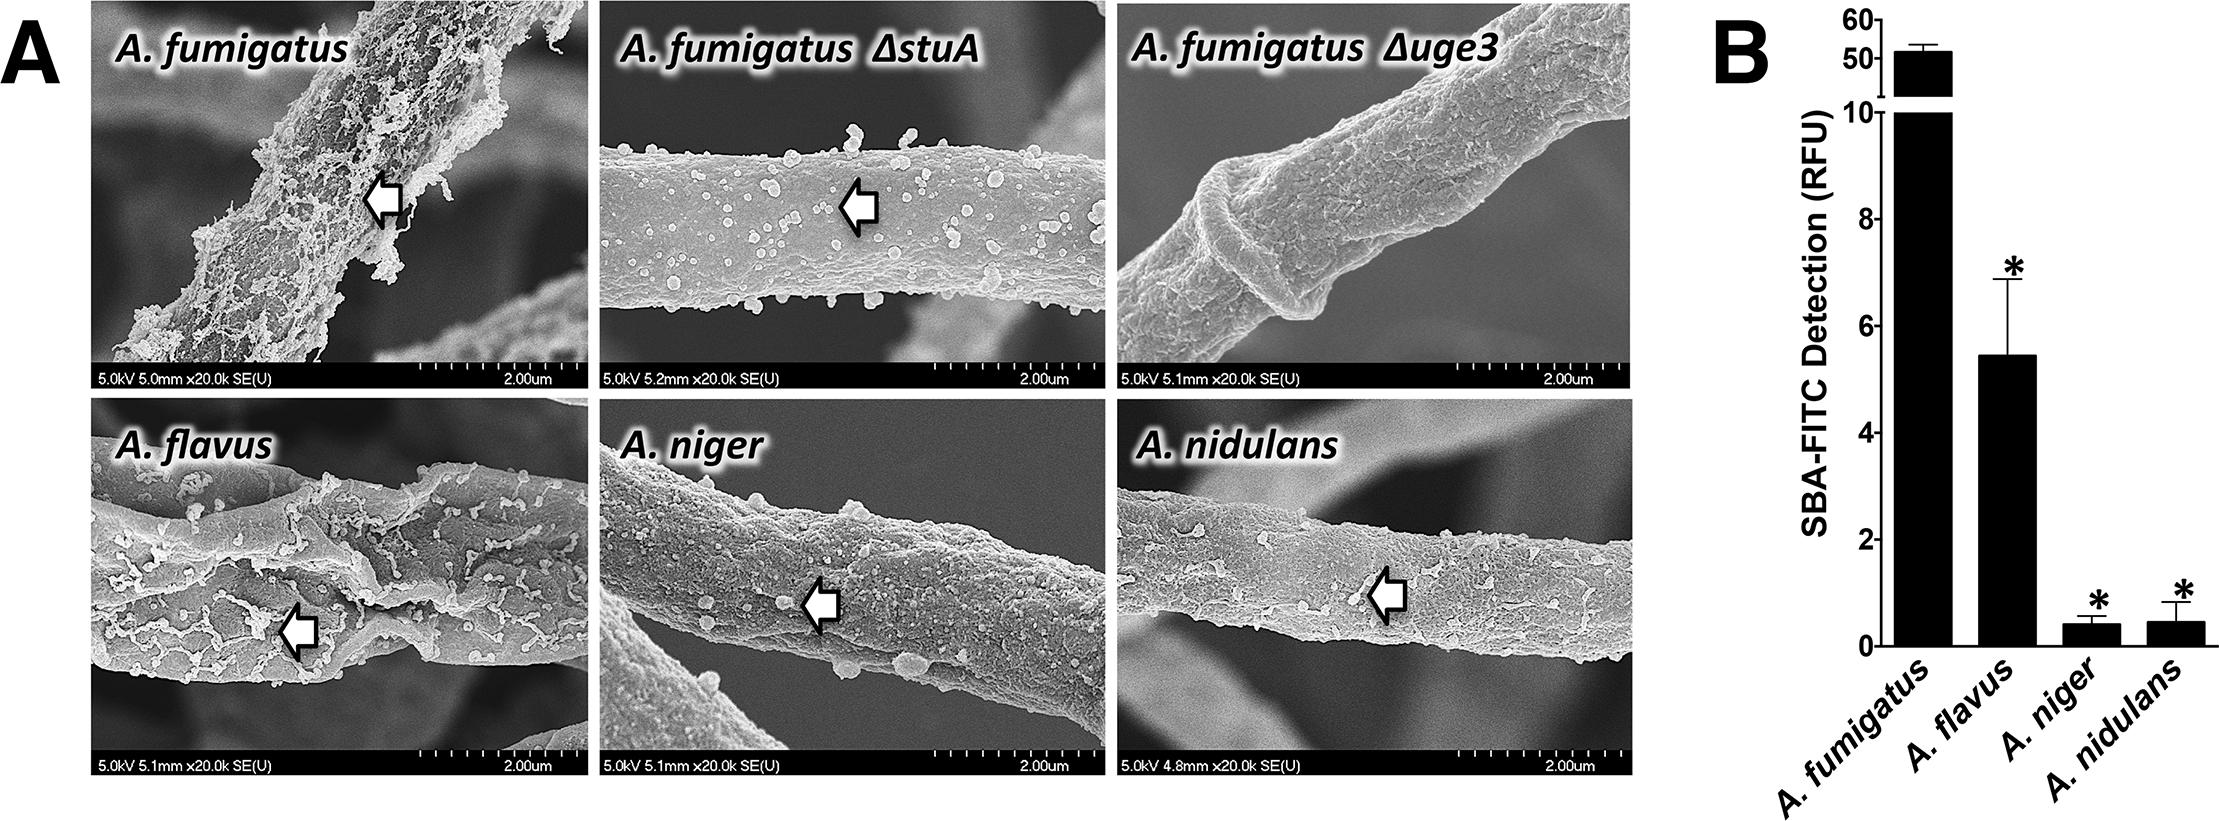 Production of GalNAc-rich GAG correlates with reported virulence of <i>Aspergillus spp</i>.